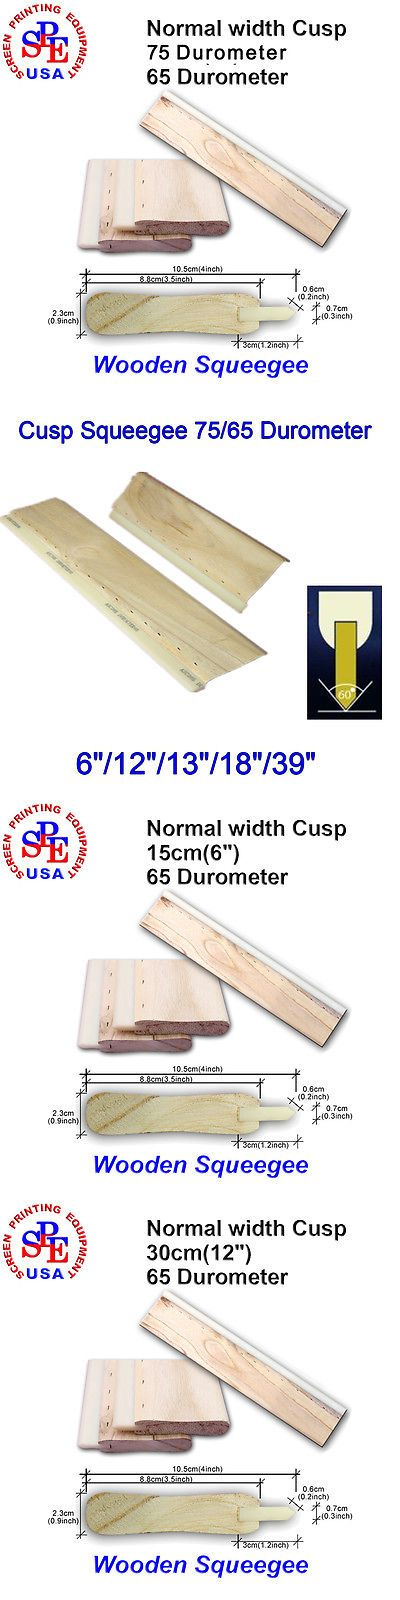 "1psc Cusp Squeegee 75//65 durometer Silk Screen Printing( 6/""//12/""//13/""//18/""//39/"")"